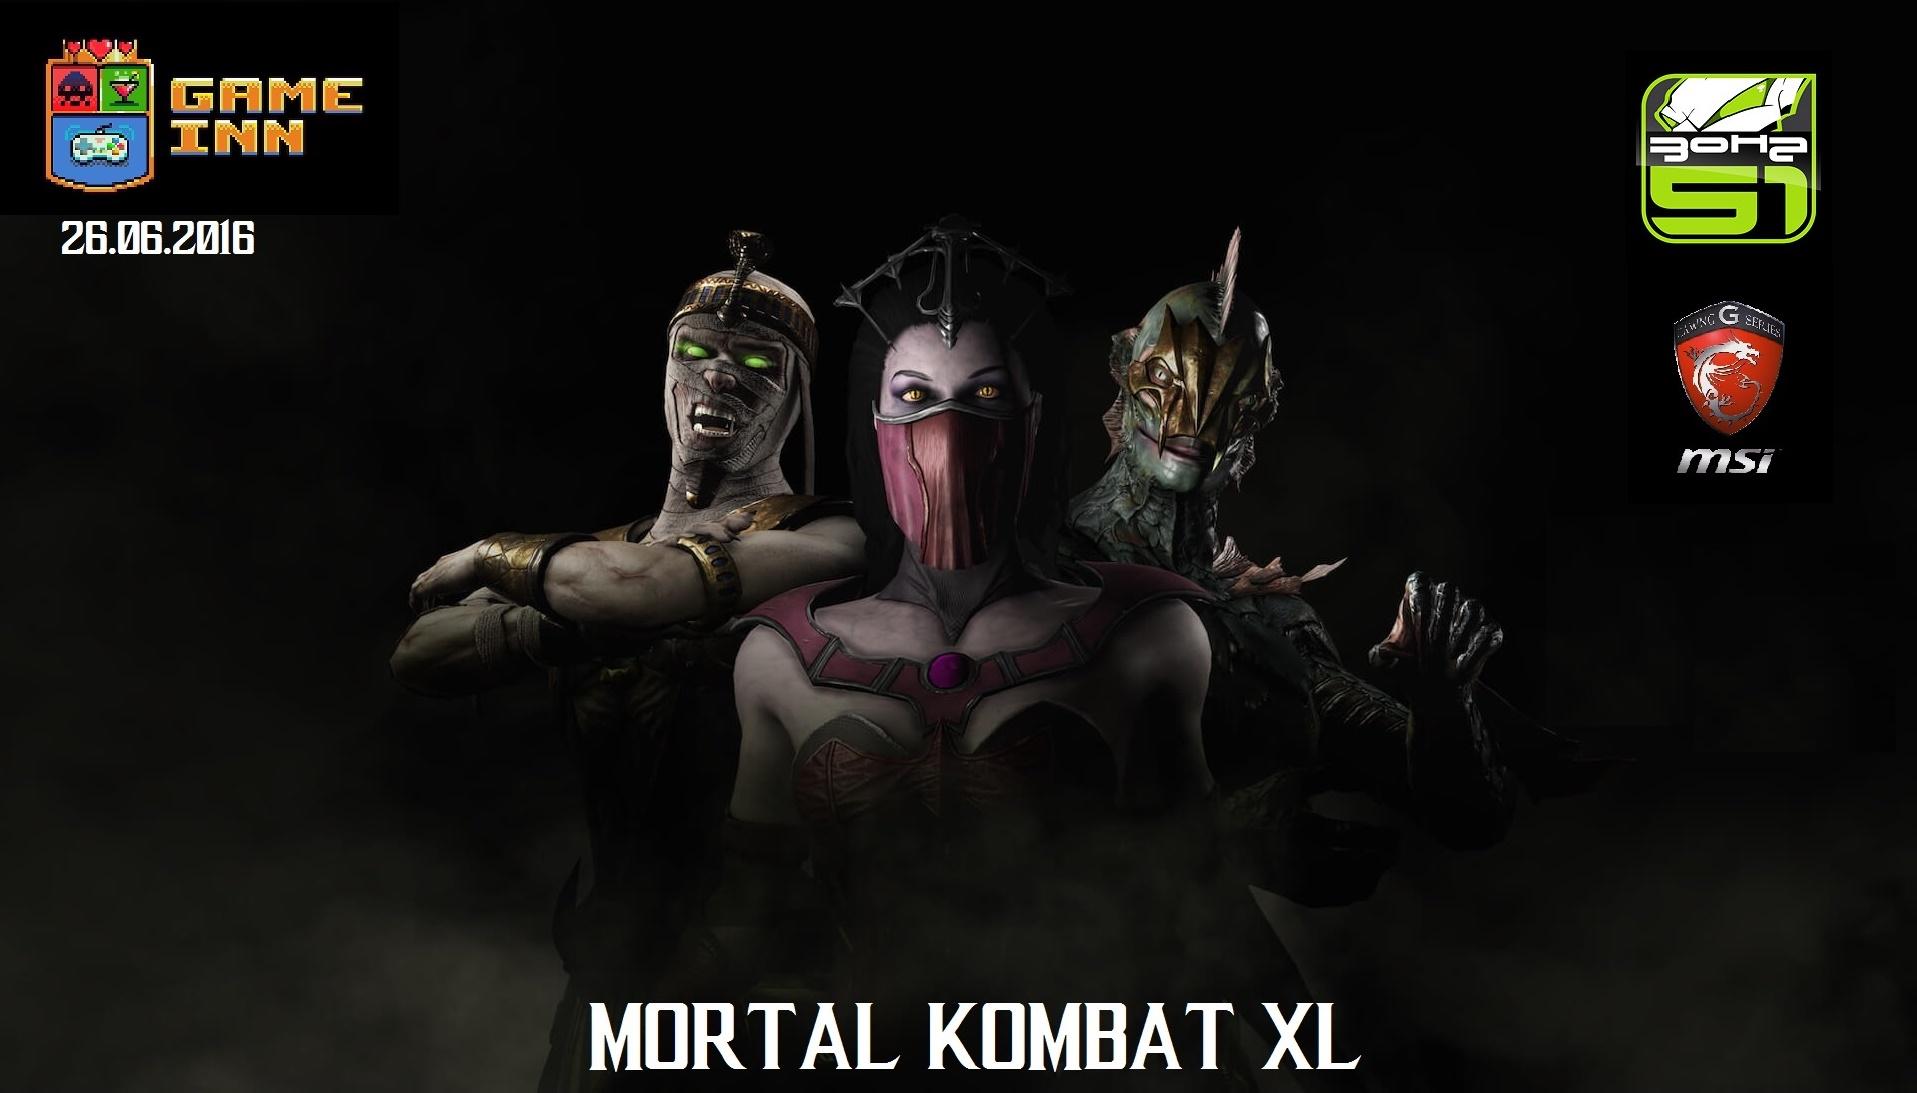 mkxl!